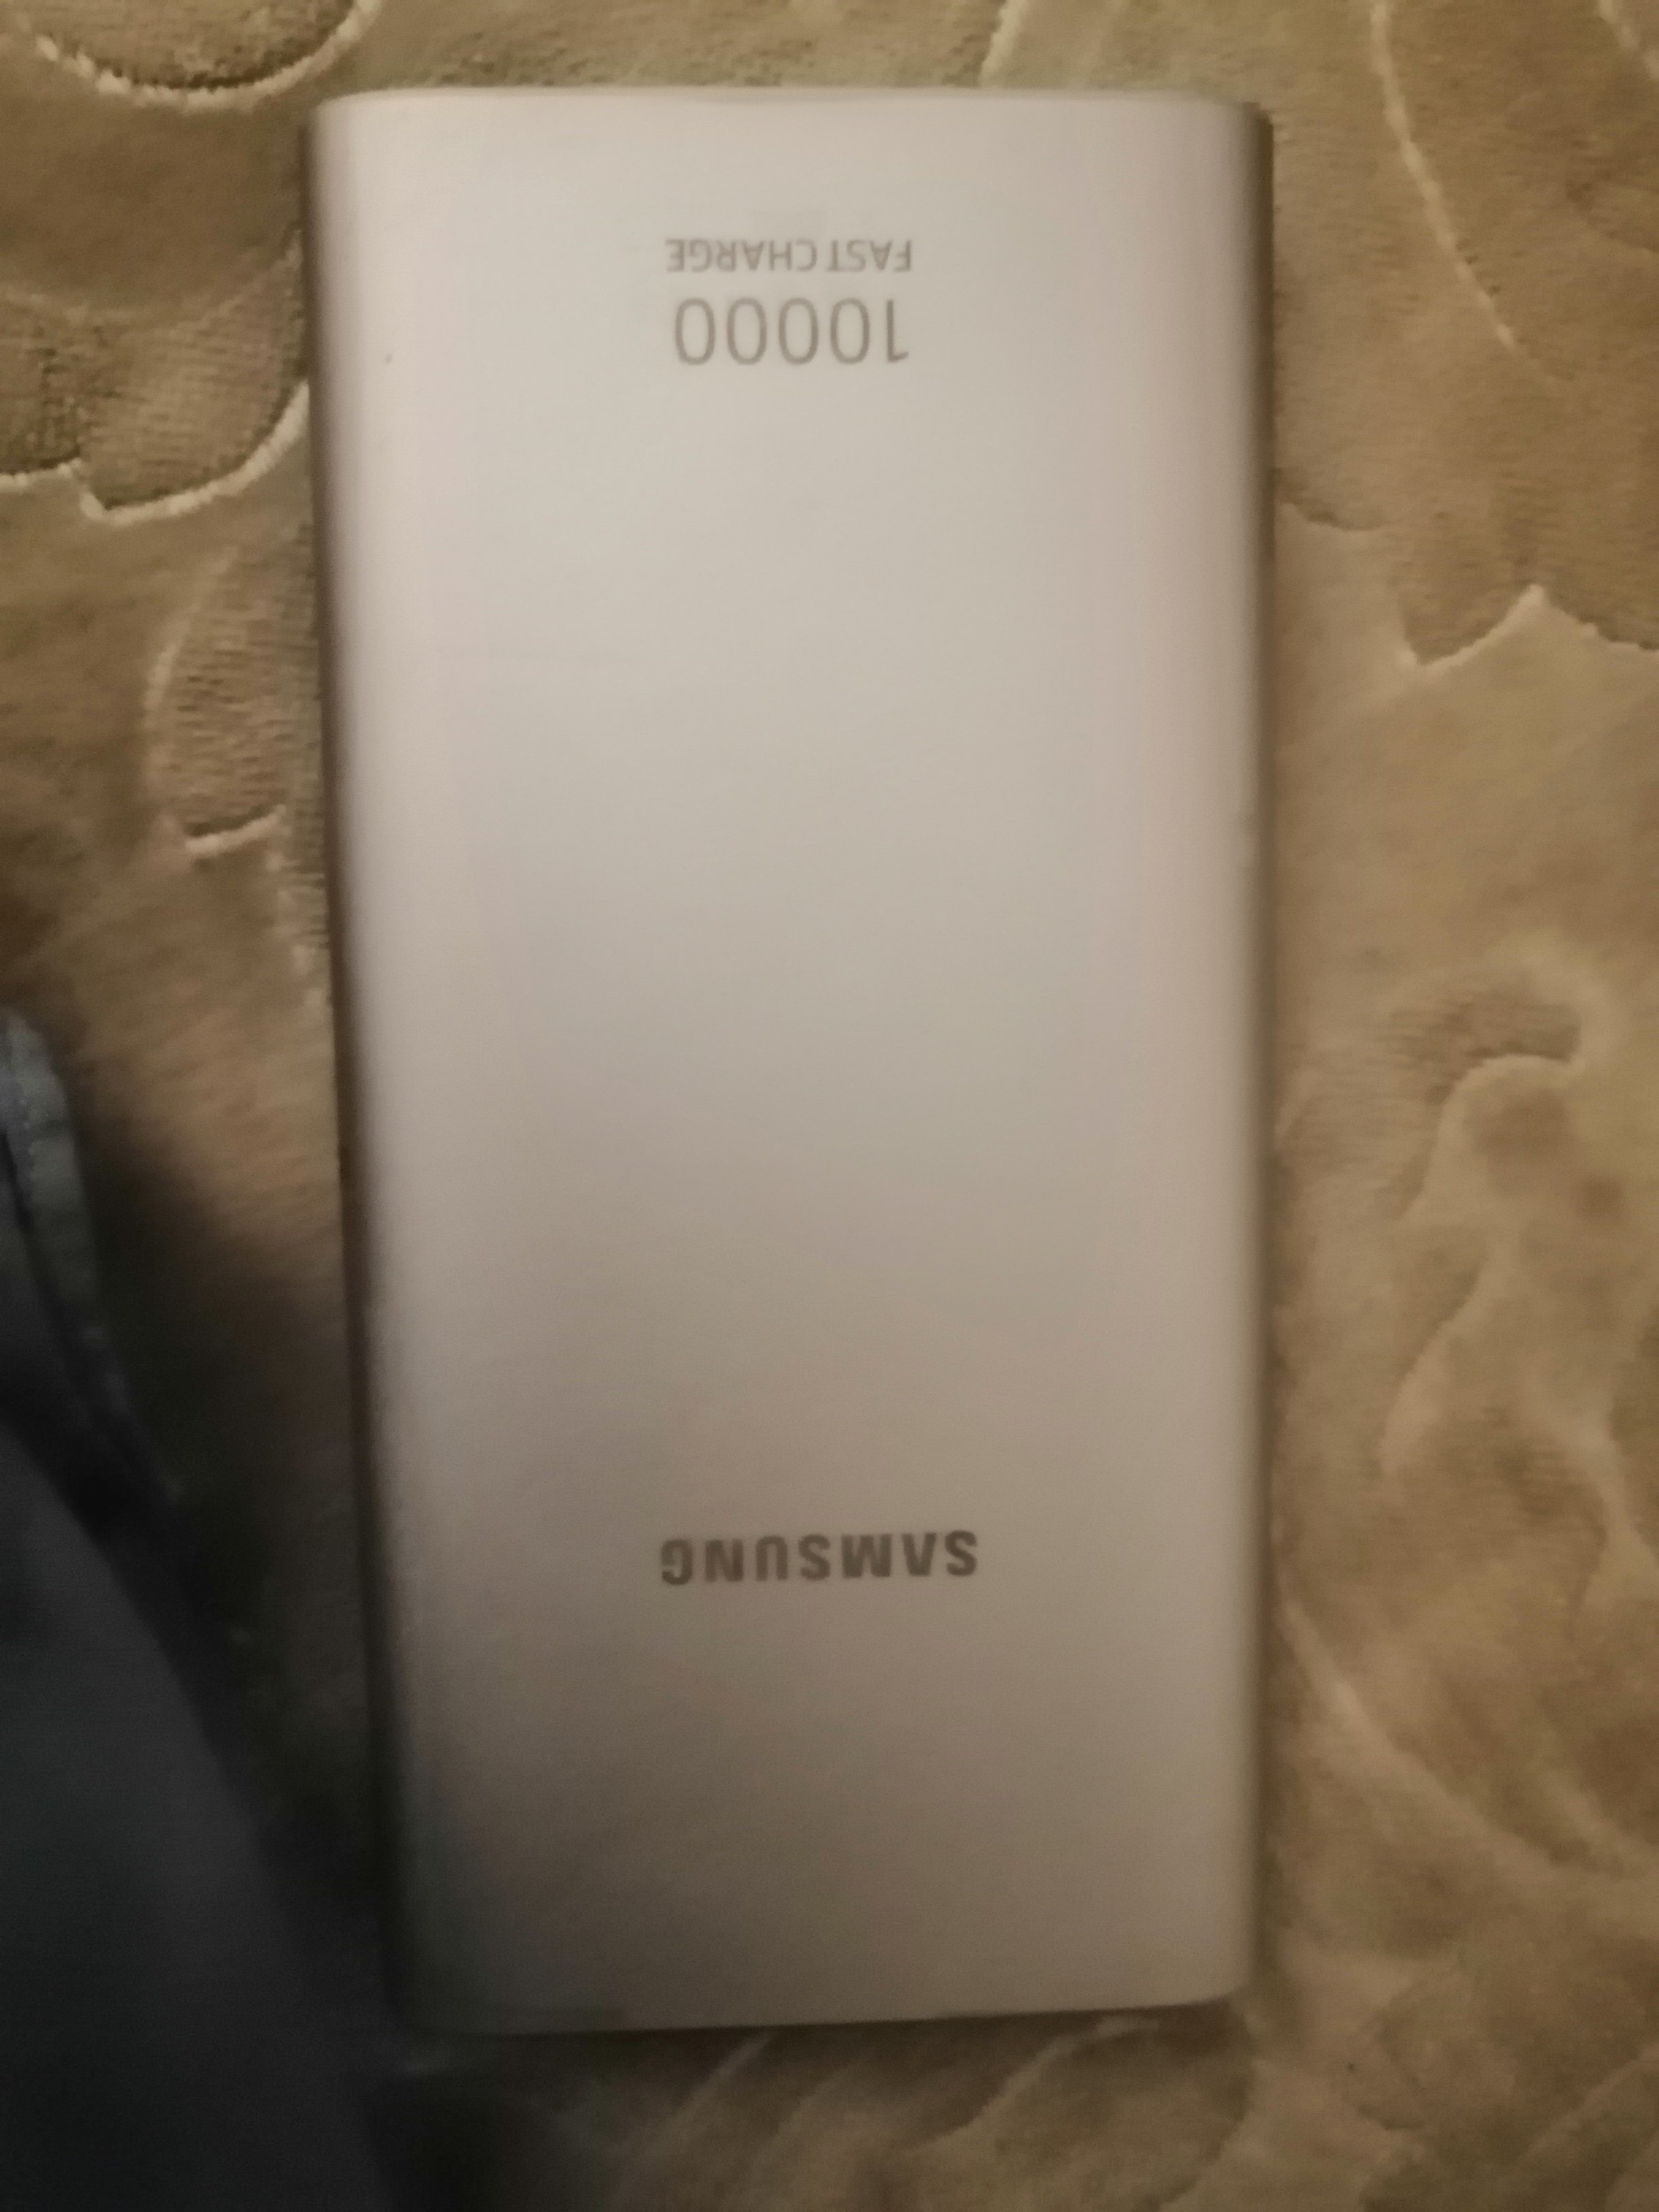 Slider item